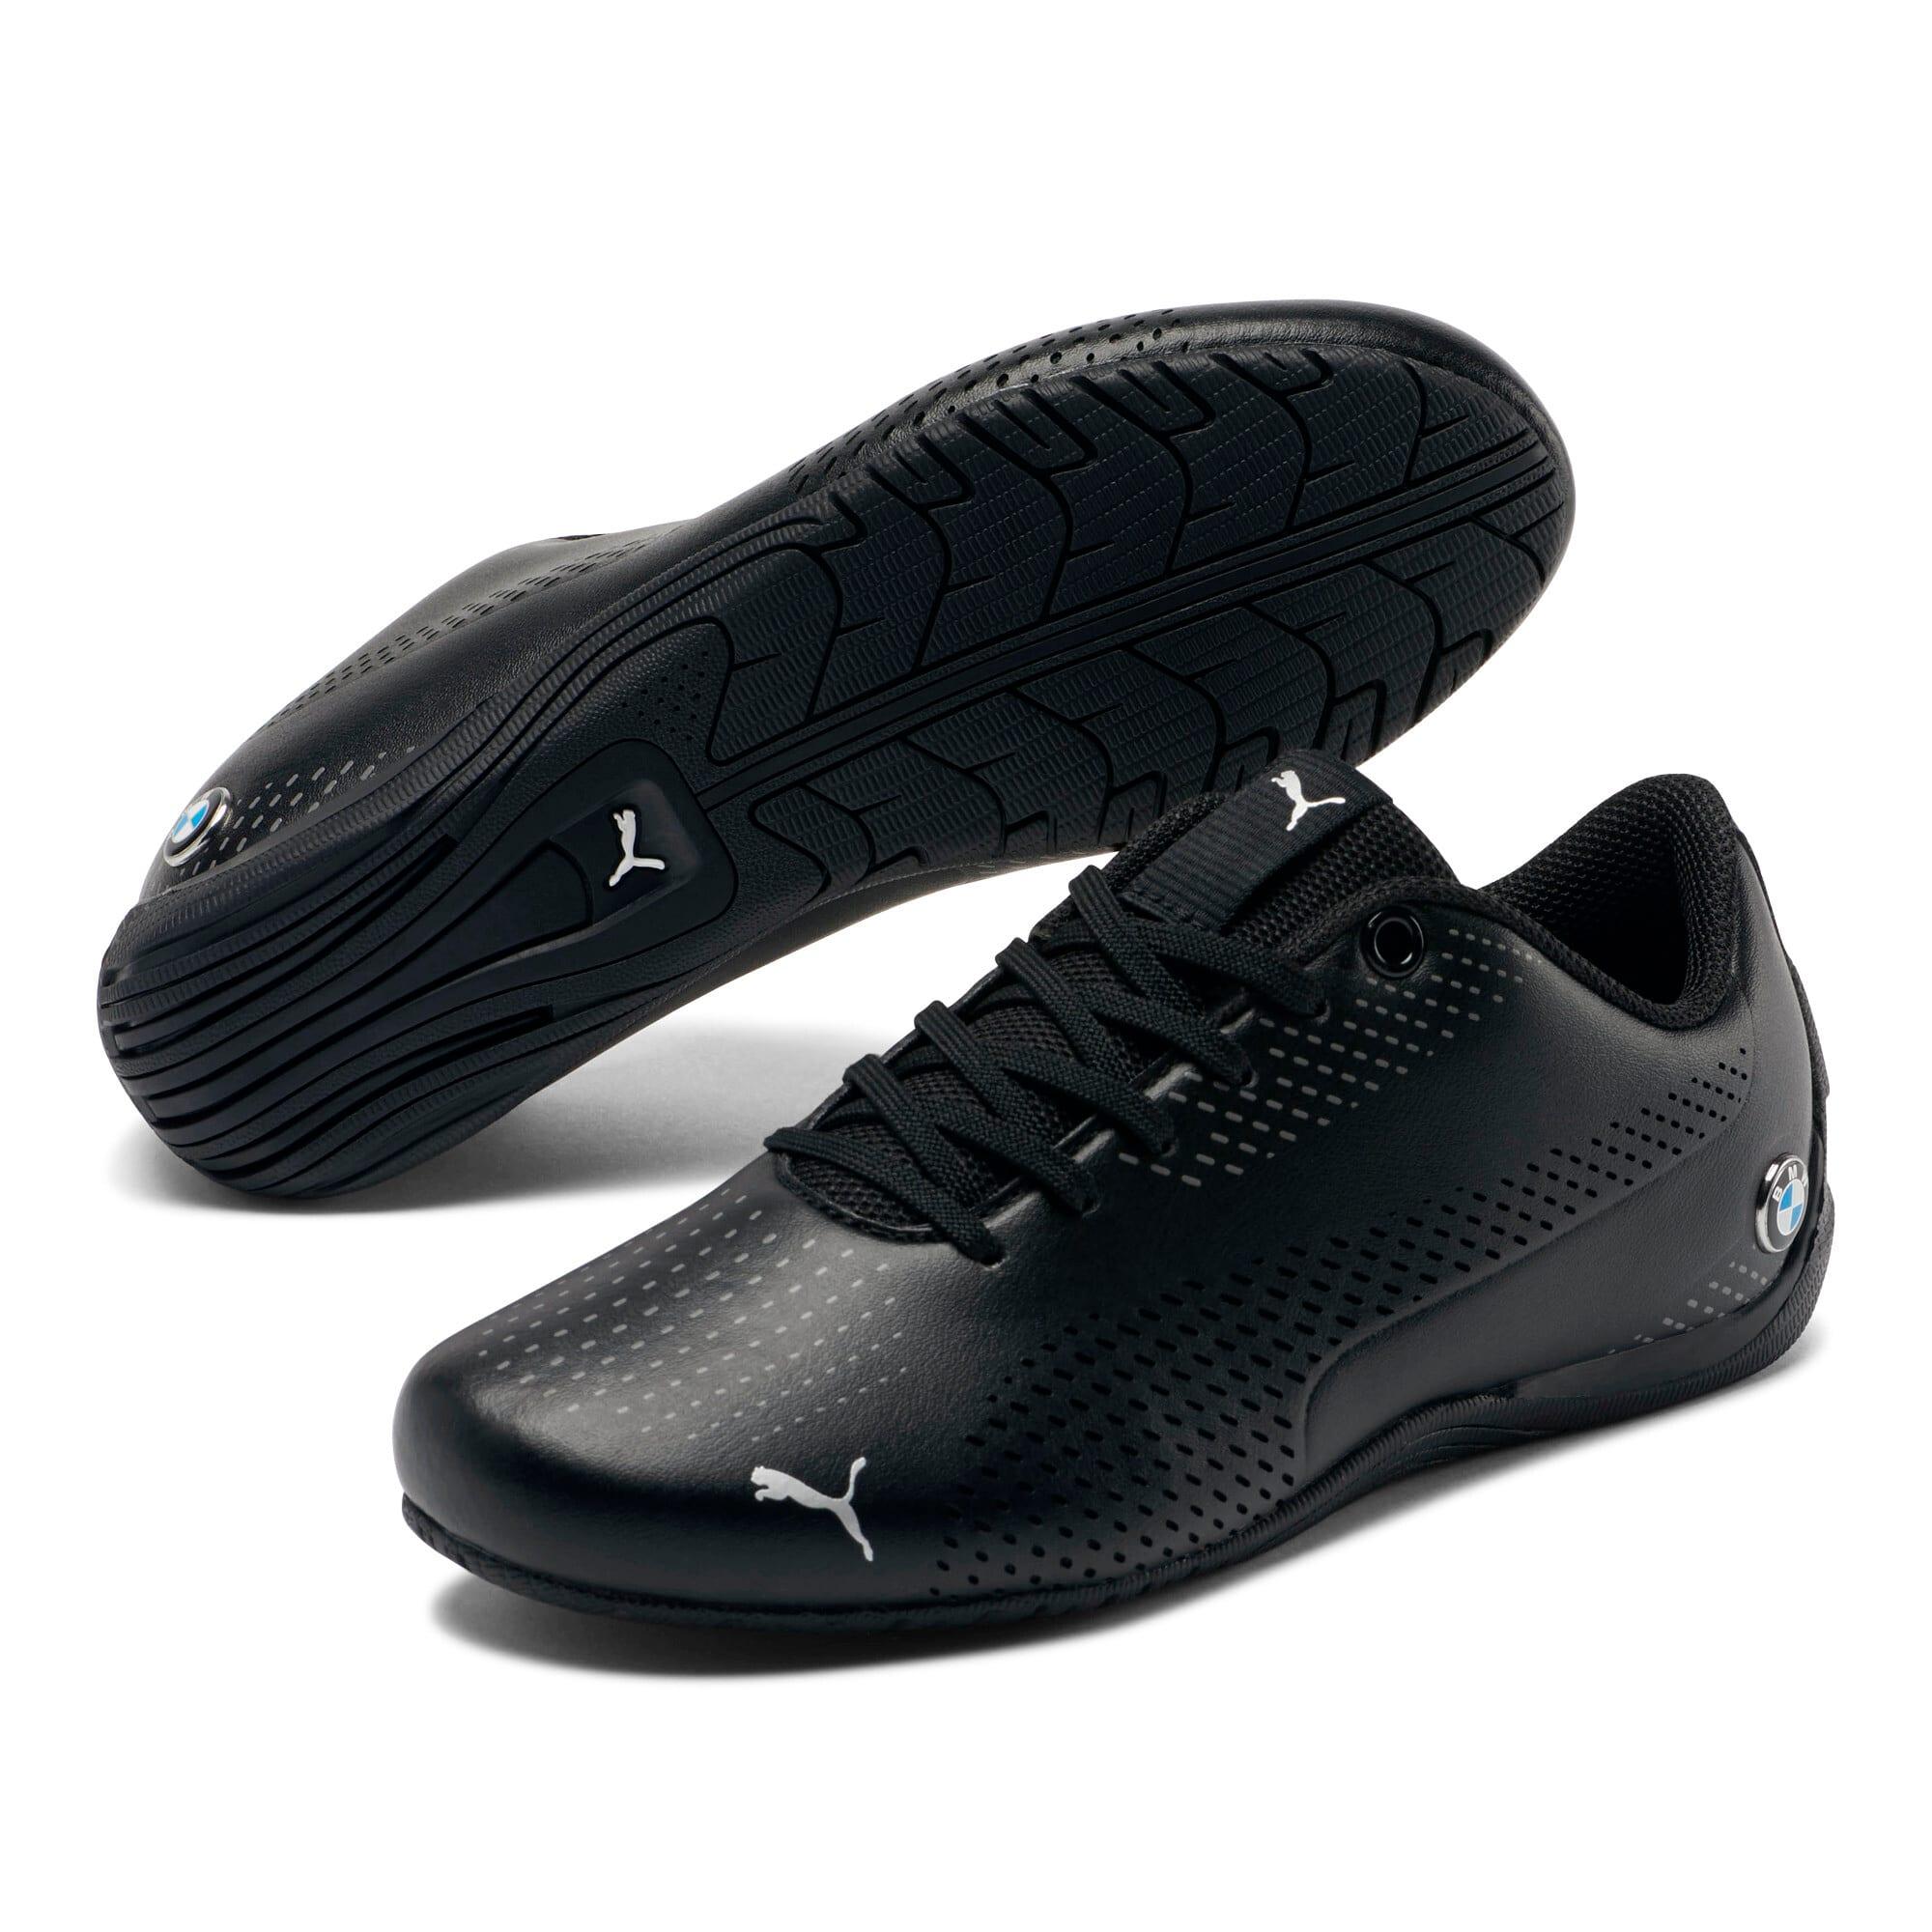 Thumbnail 2 of BMW M Motorsport Drift Cat 5 Ultra II Shoes JR, Puma Black-Puma Black, medium